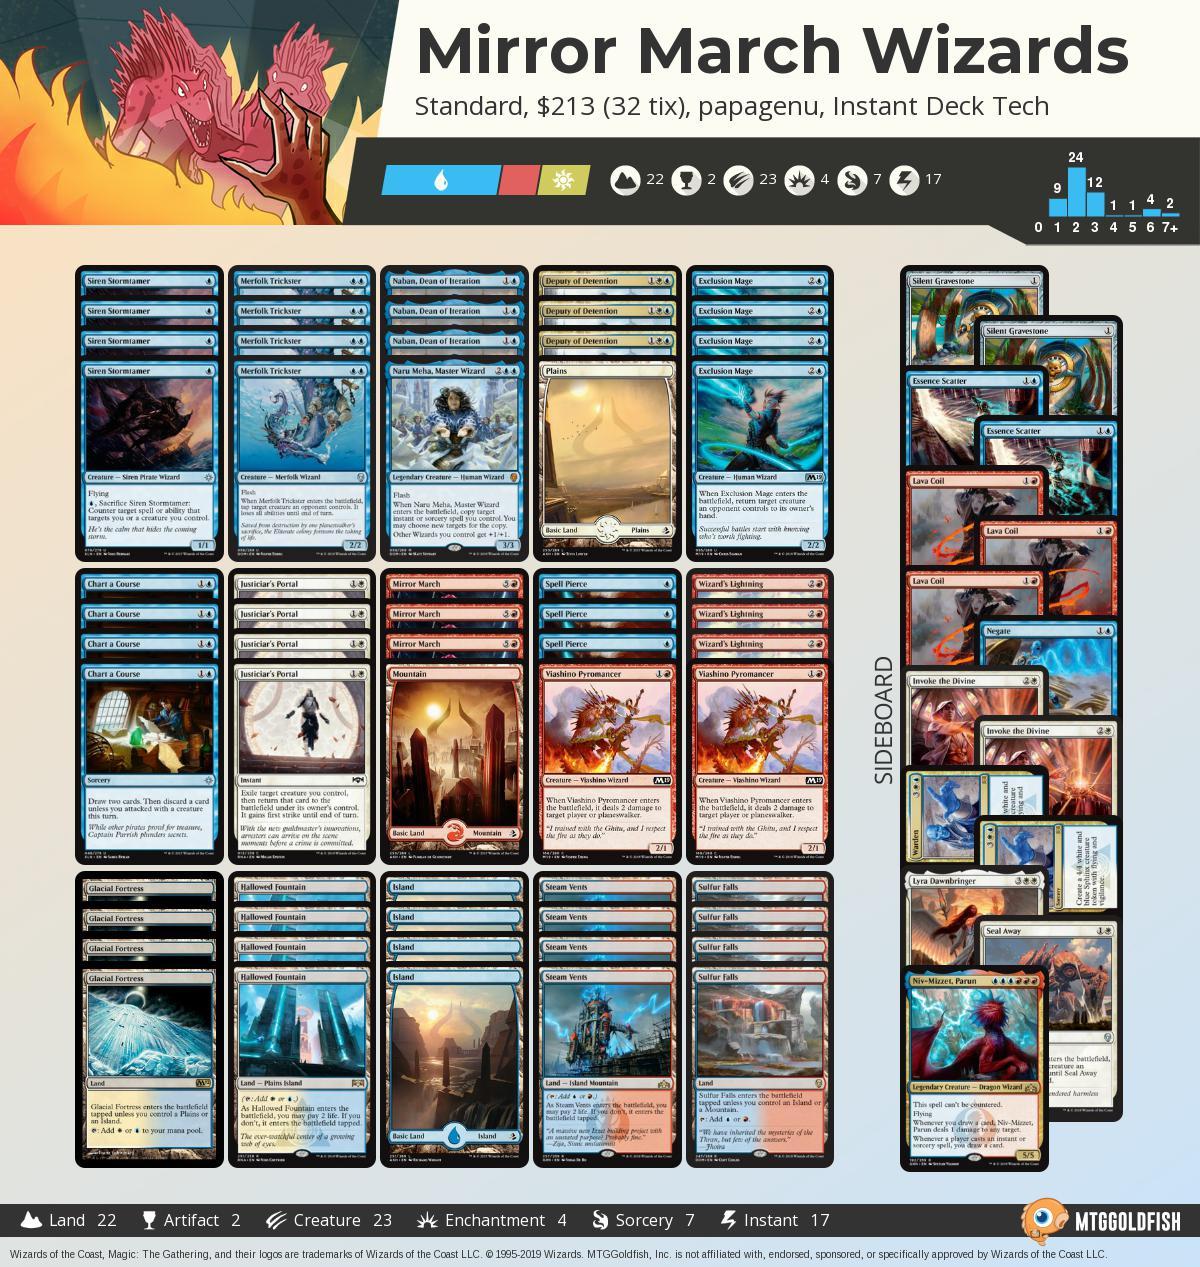 Mirror%2bmarch%2bwizards fe36e040 2de7 46fd 9fe9 b1ba92aae128%2ejpg